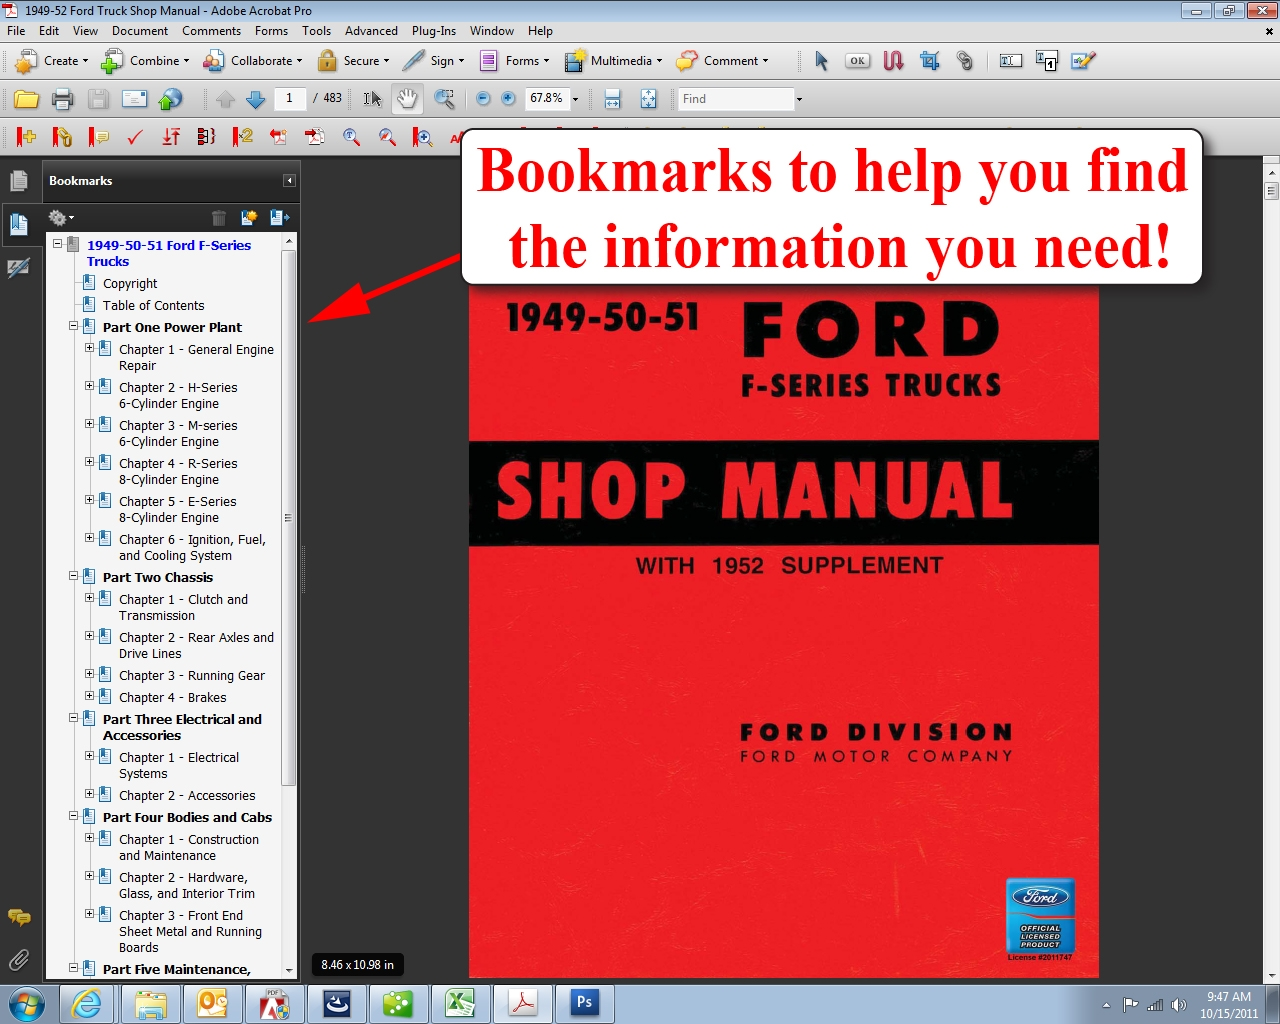 1949-52 Ford Truck Shop Manual: Ford Motor Company, David E. LeBlanc:  9781603710626: Amazon.com: Books